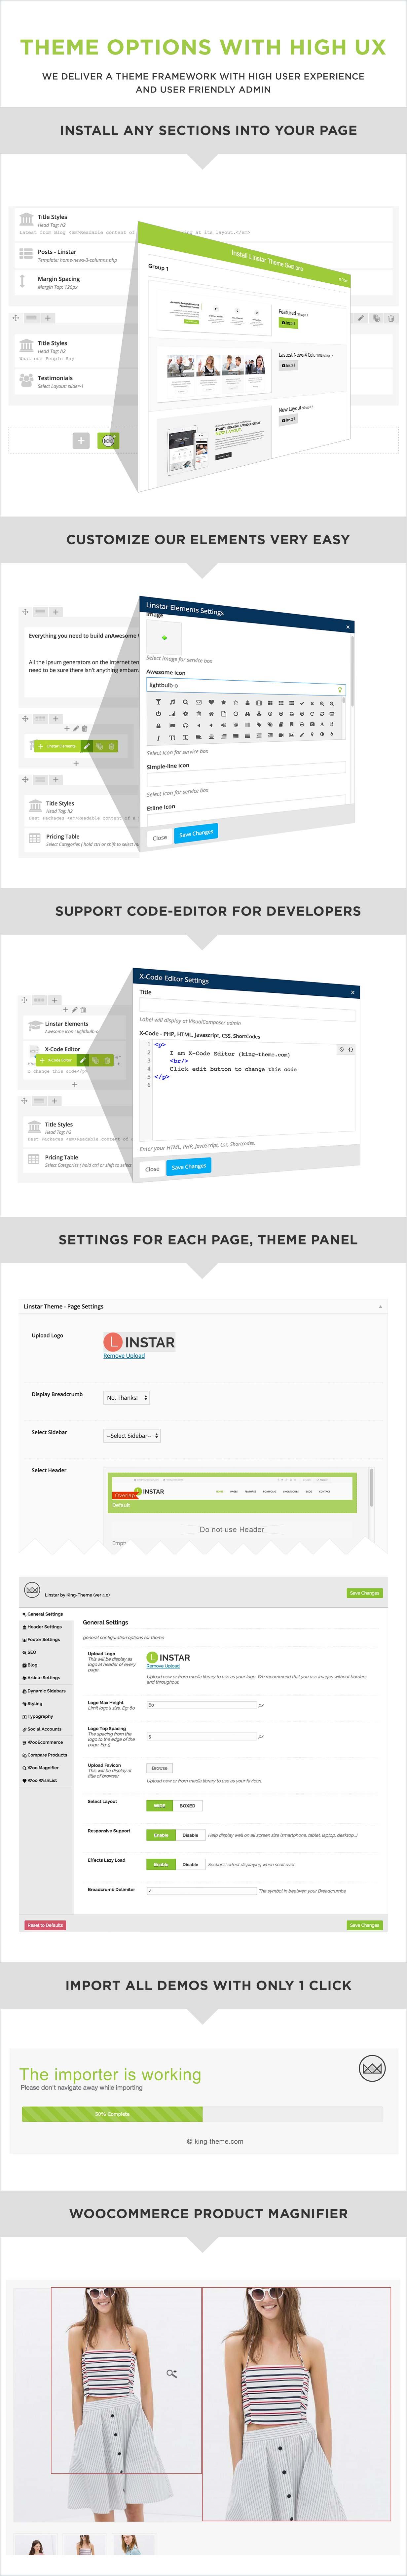 des5 - Linstar - MultiPurpose WordPress Theme